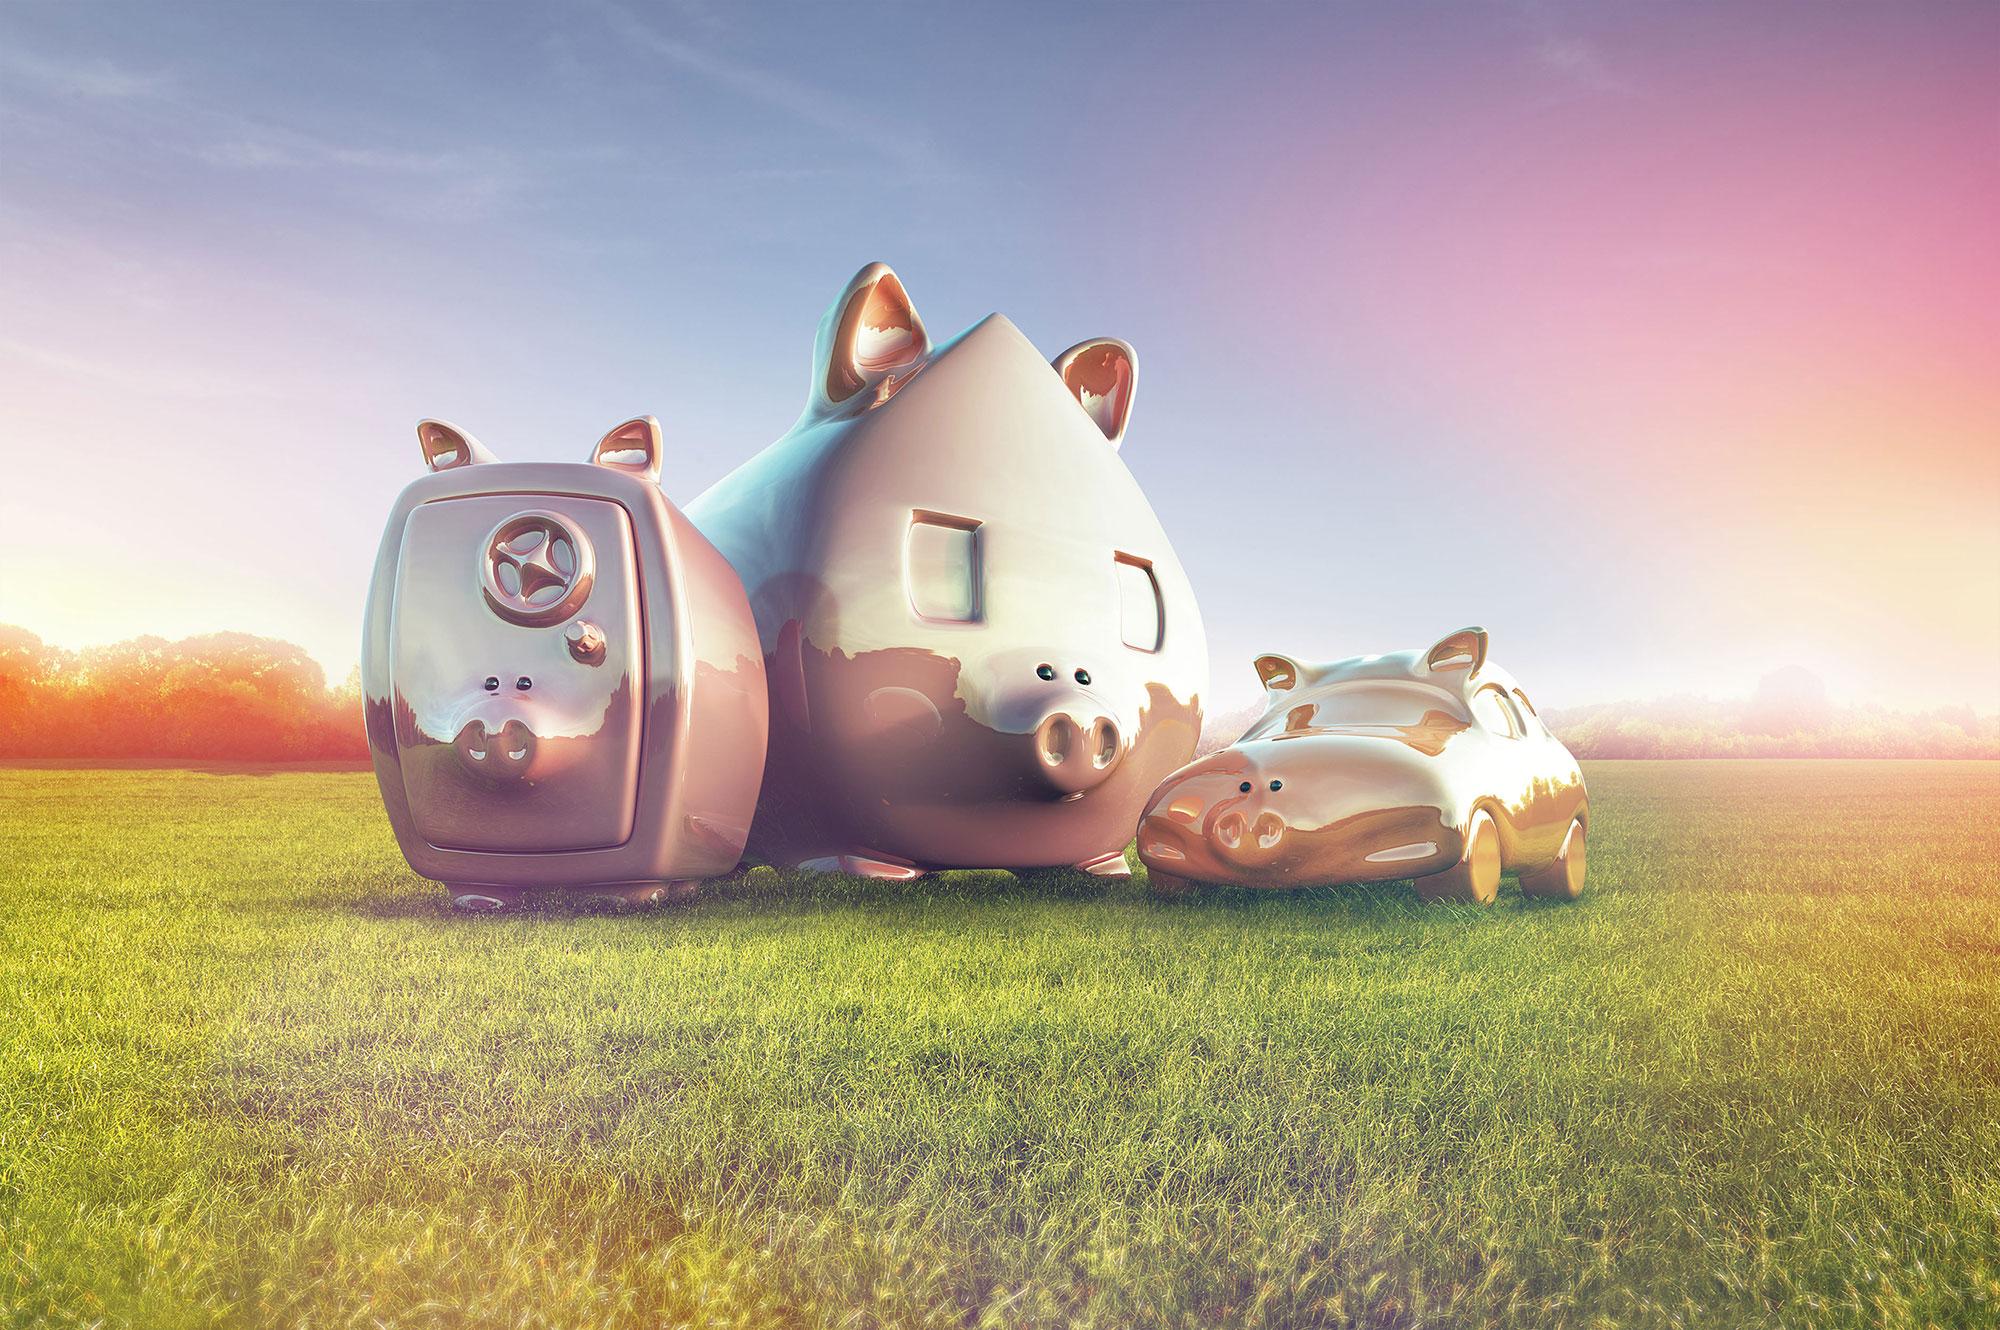 CGI Rendering 3d PS-Sparen Sparschwein Tresor Auto Haus Wiese HDRI Backplate Sphere Idris Kolodziej